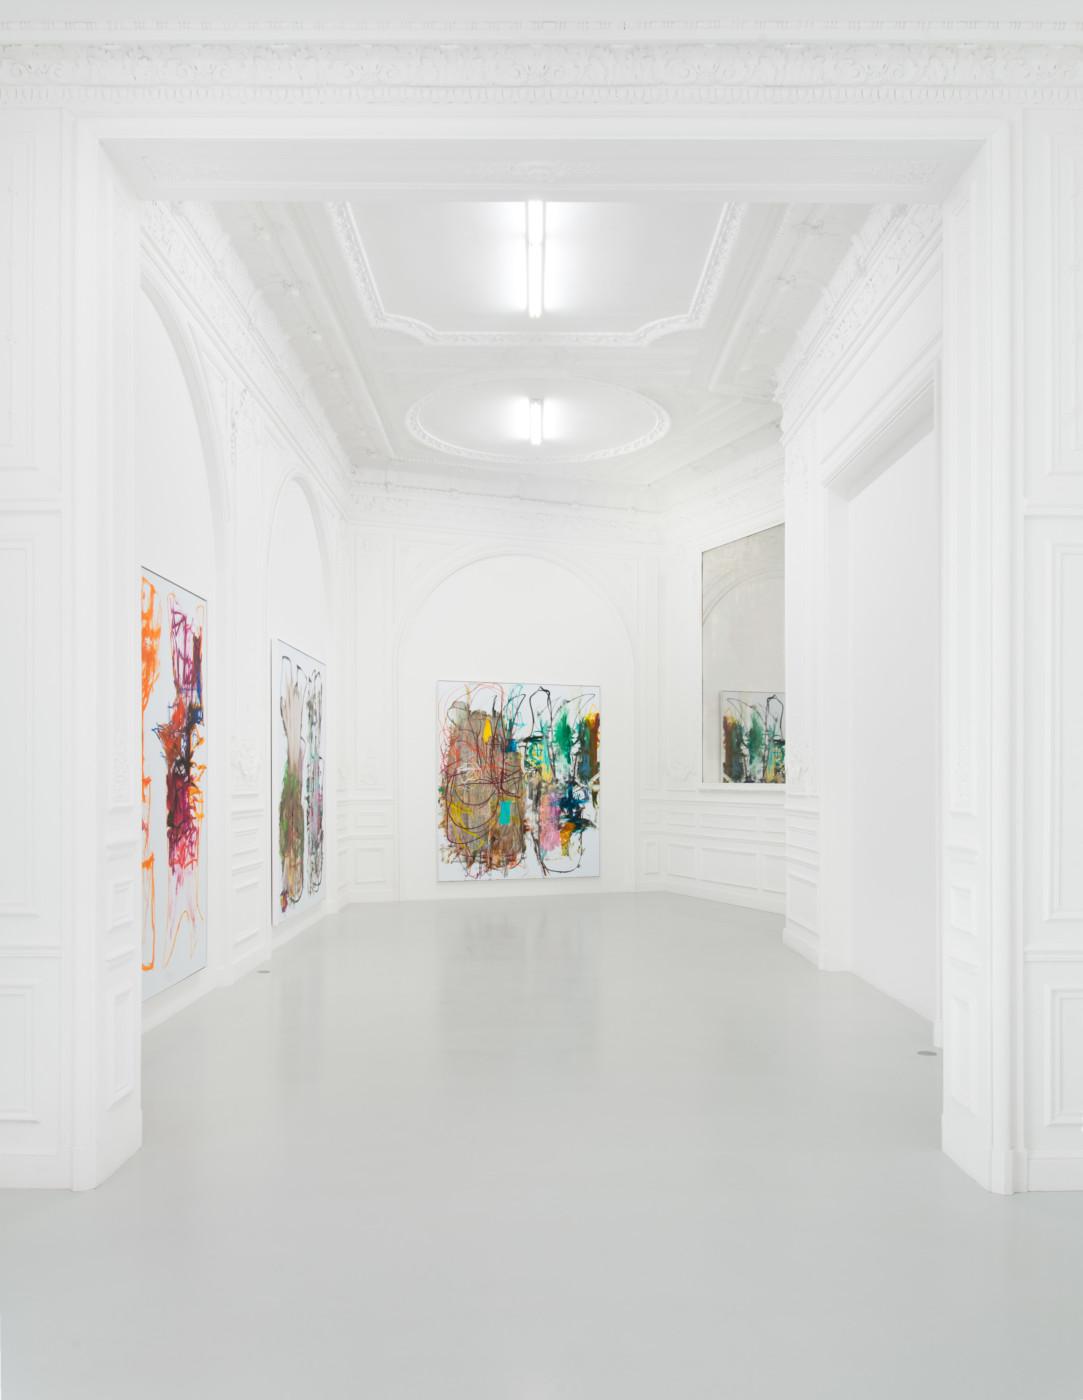 AARON  GARBER-MAIKOVSKA  homebirth , 2018, High Art, Paris, installation view - High Art Gallery Paris